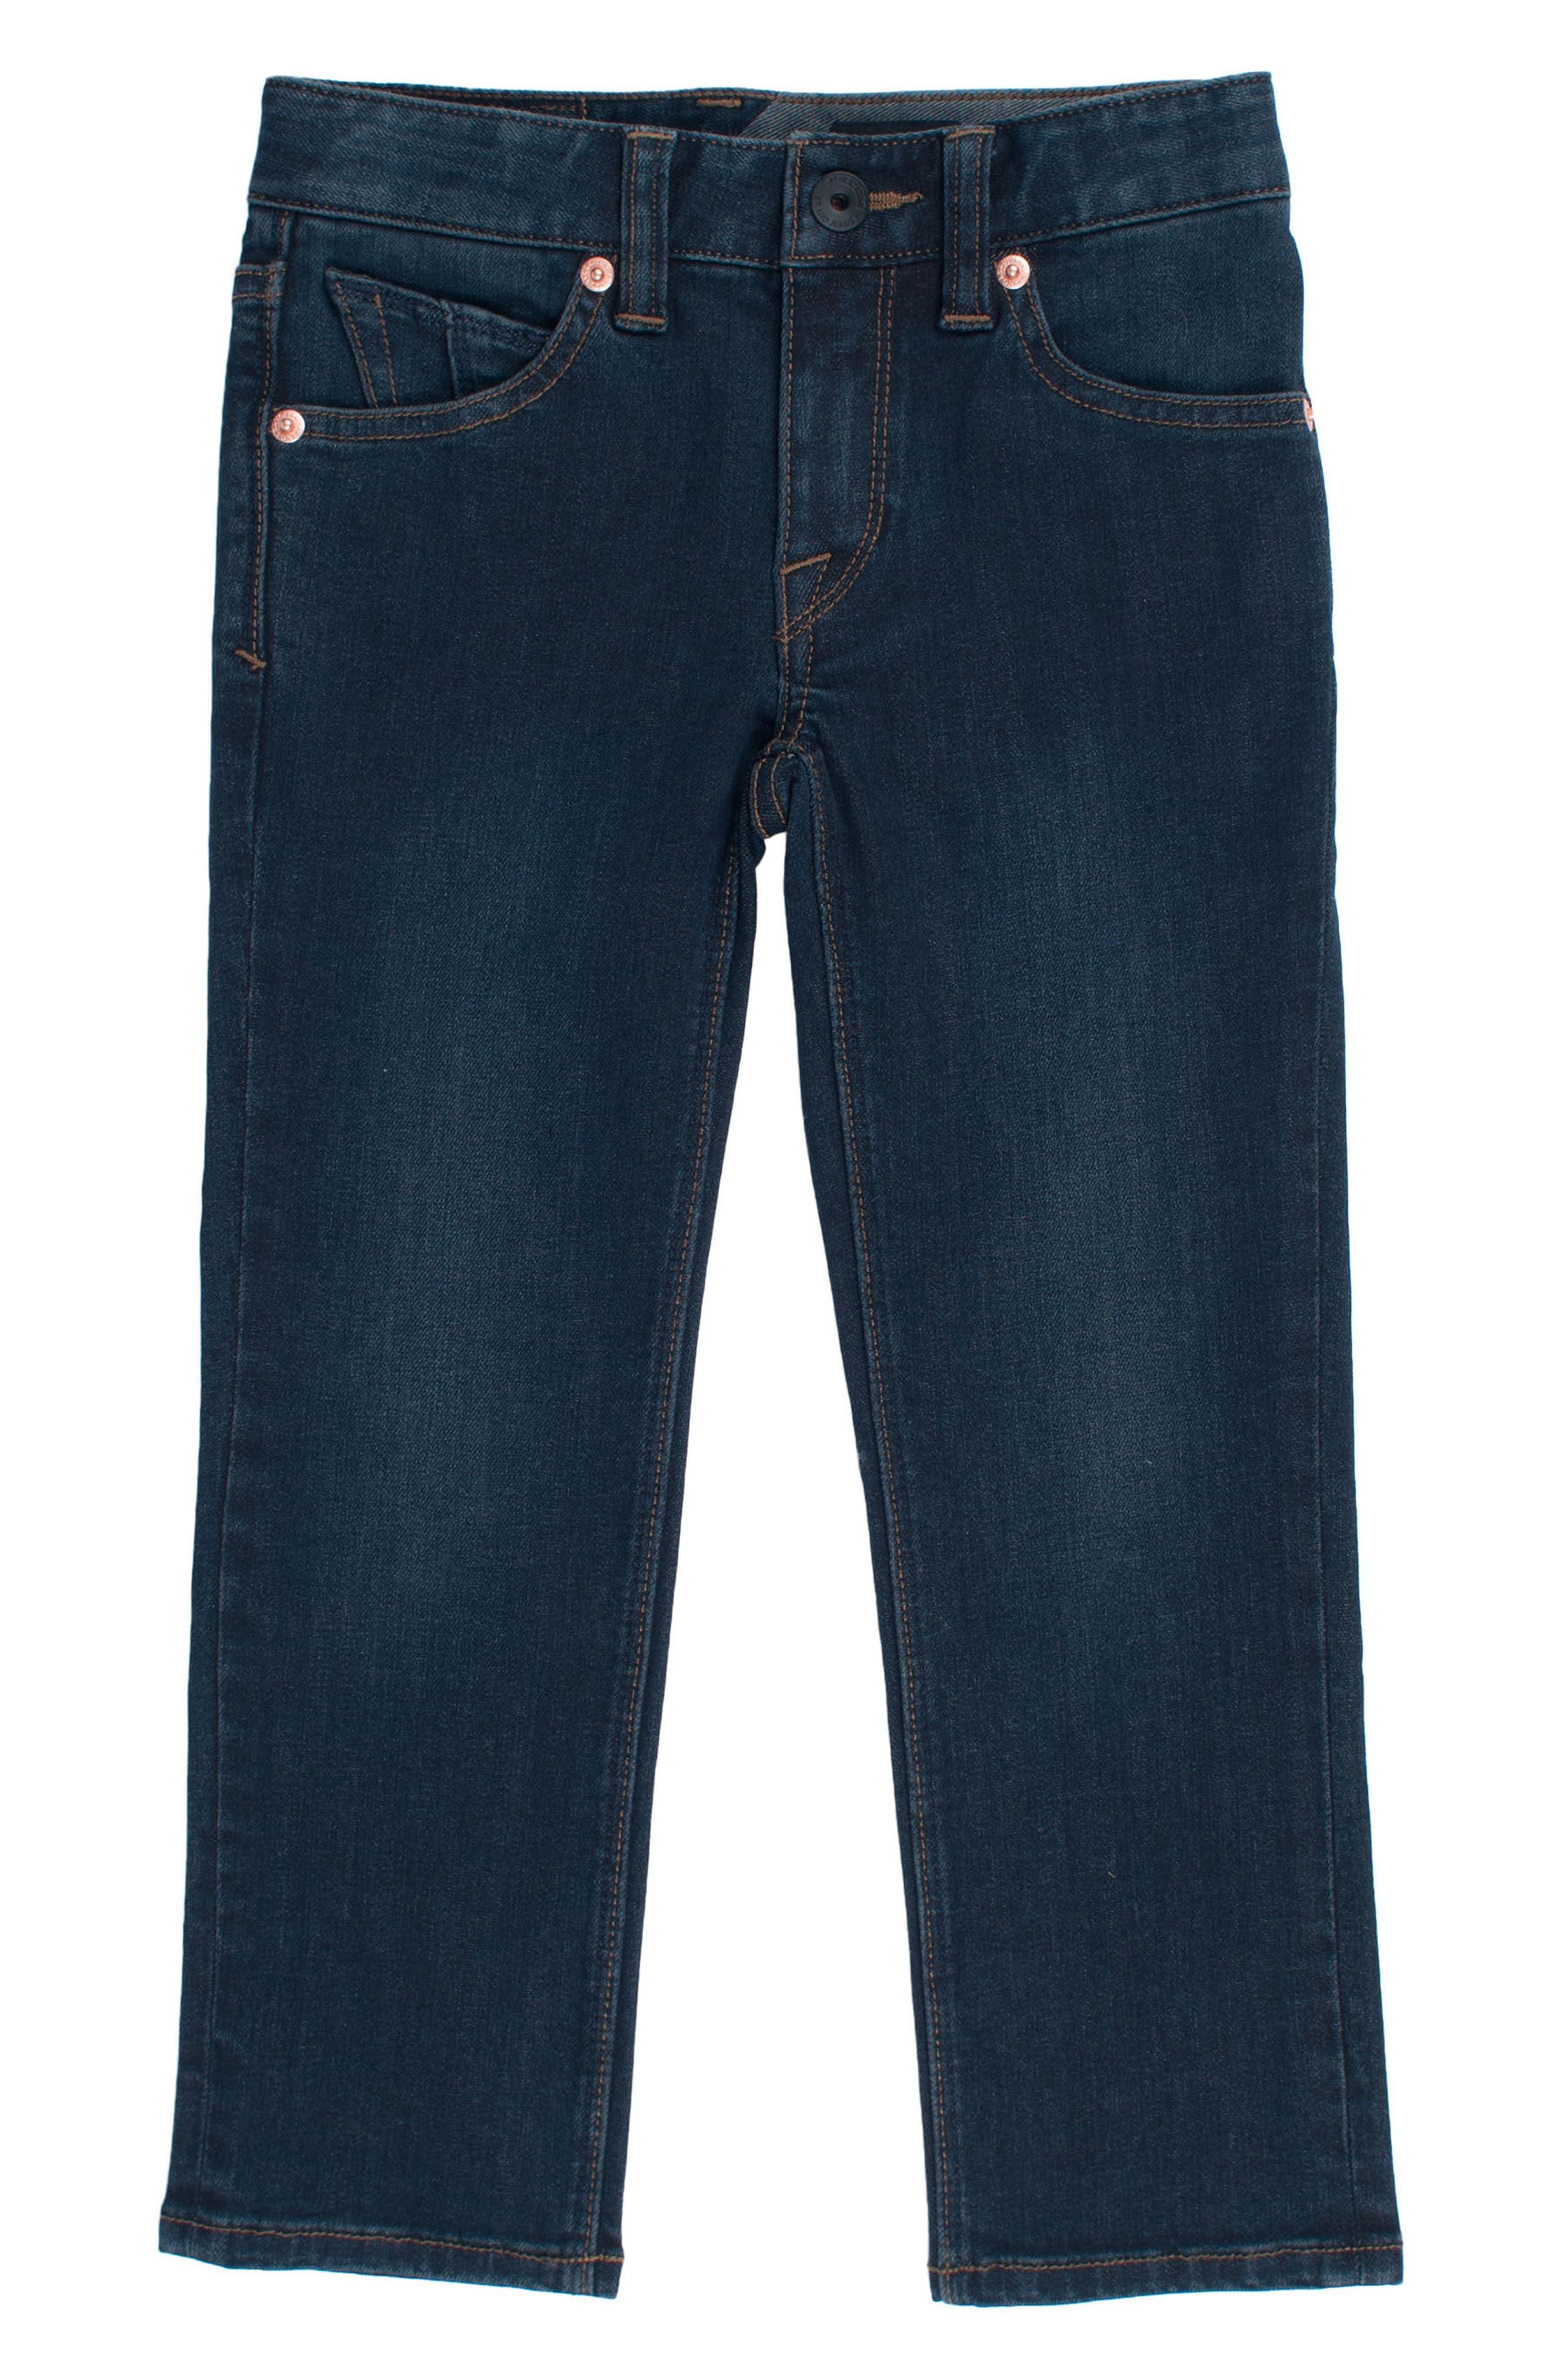 Volcom Vorta Slim Fit Jeans (Toddler Boys & Little Boys)